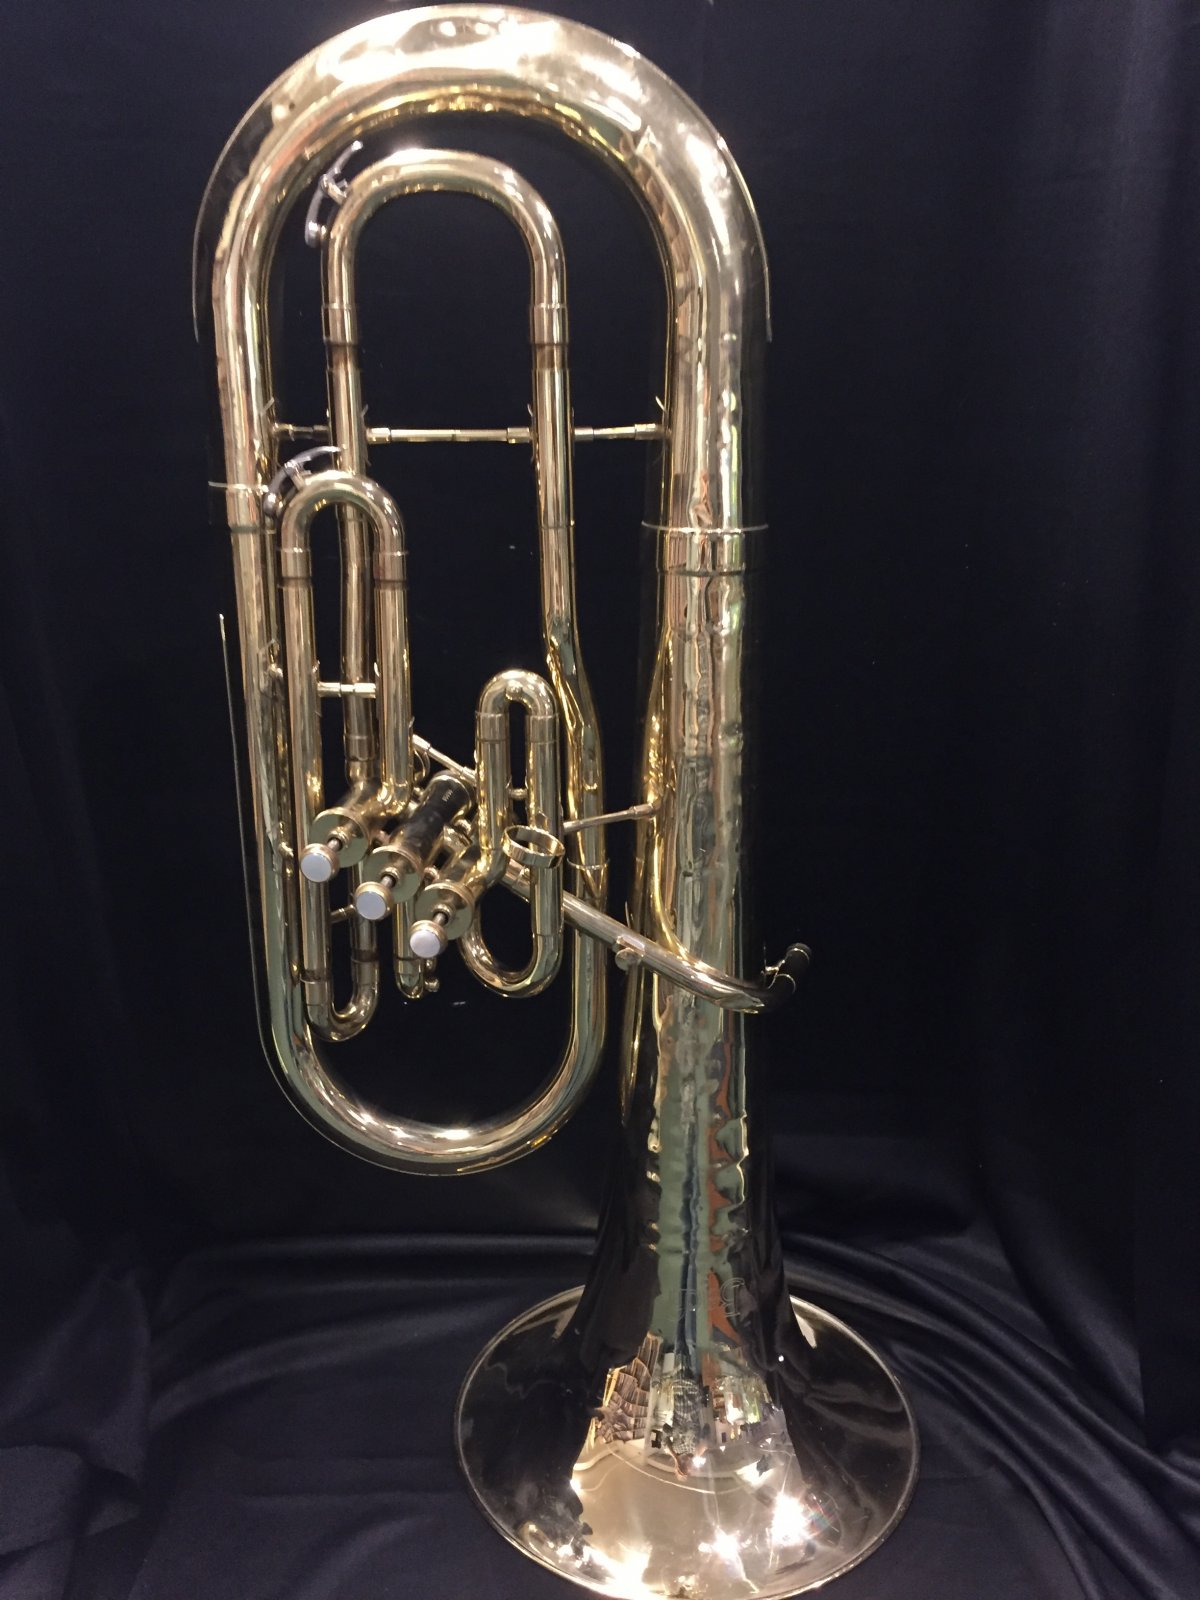 USED Bach 1829 3/4 Sized Euphonium - Fair condition